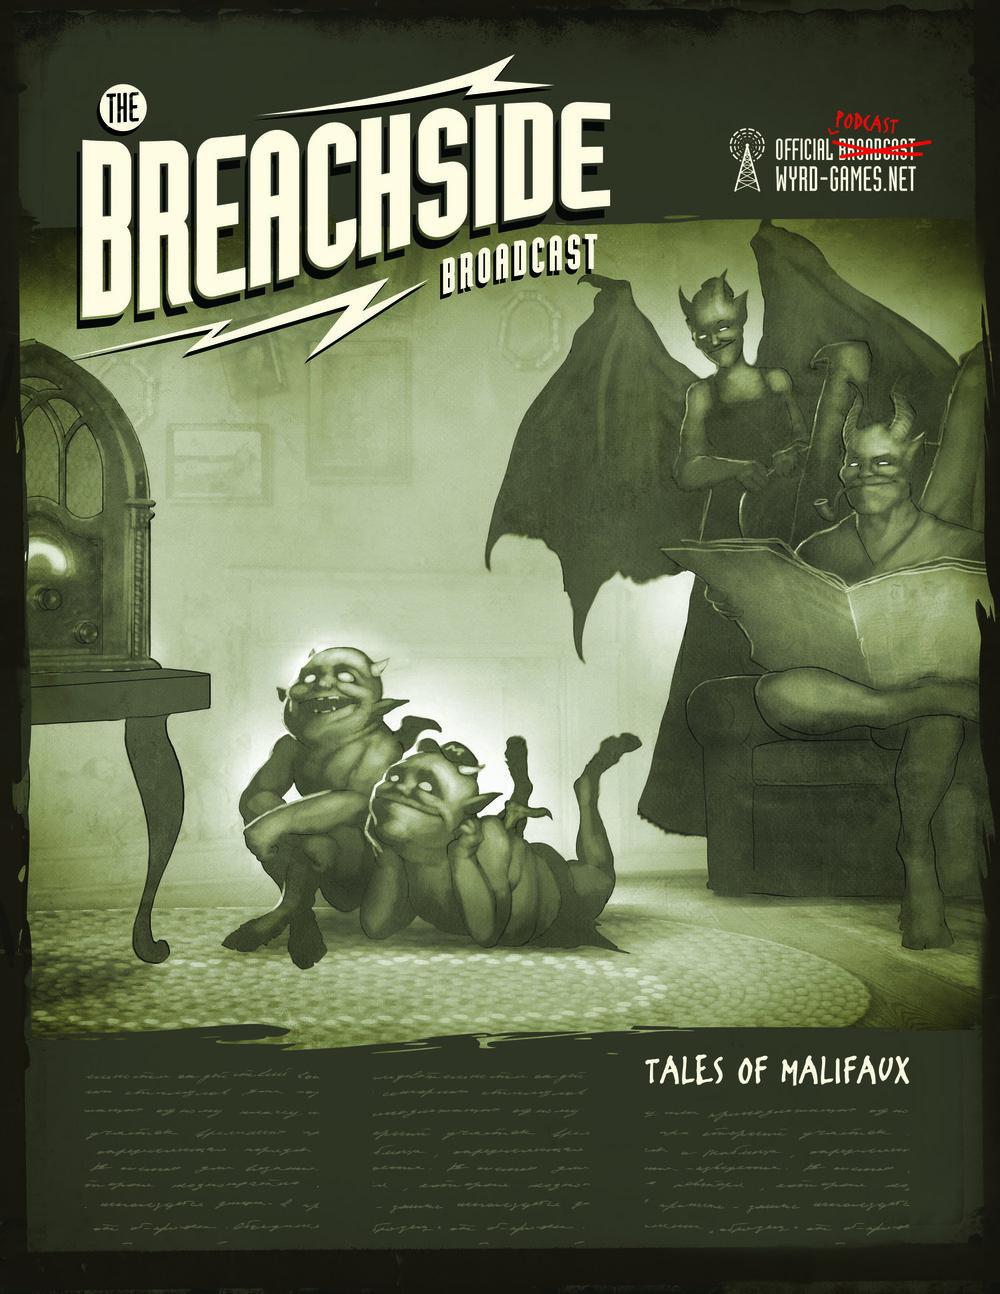 Breachside Broadcast Website Img.jpg